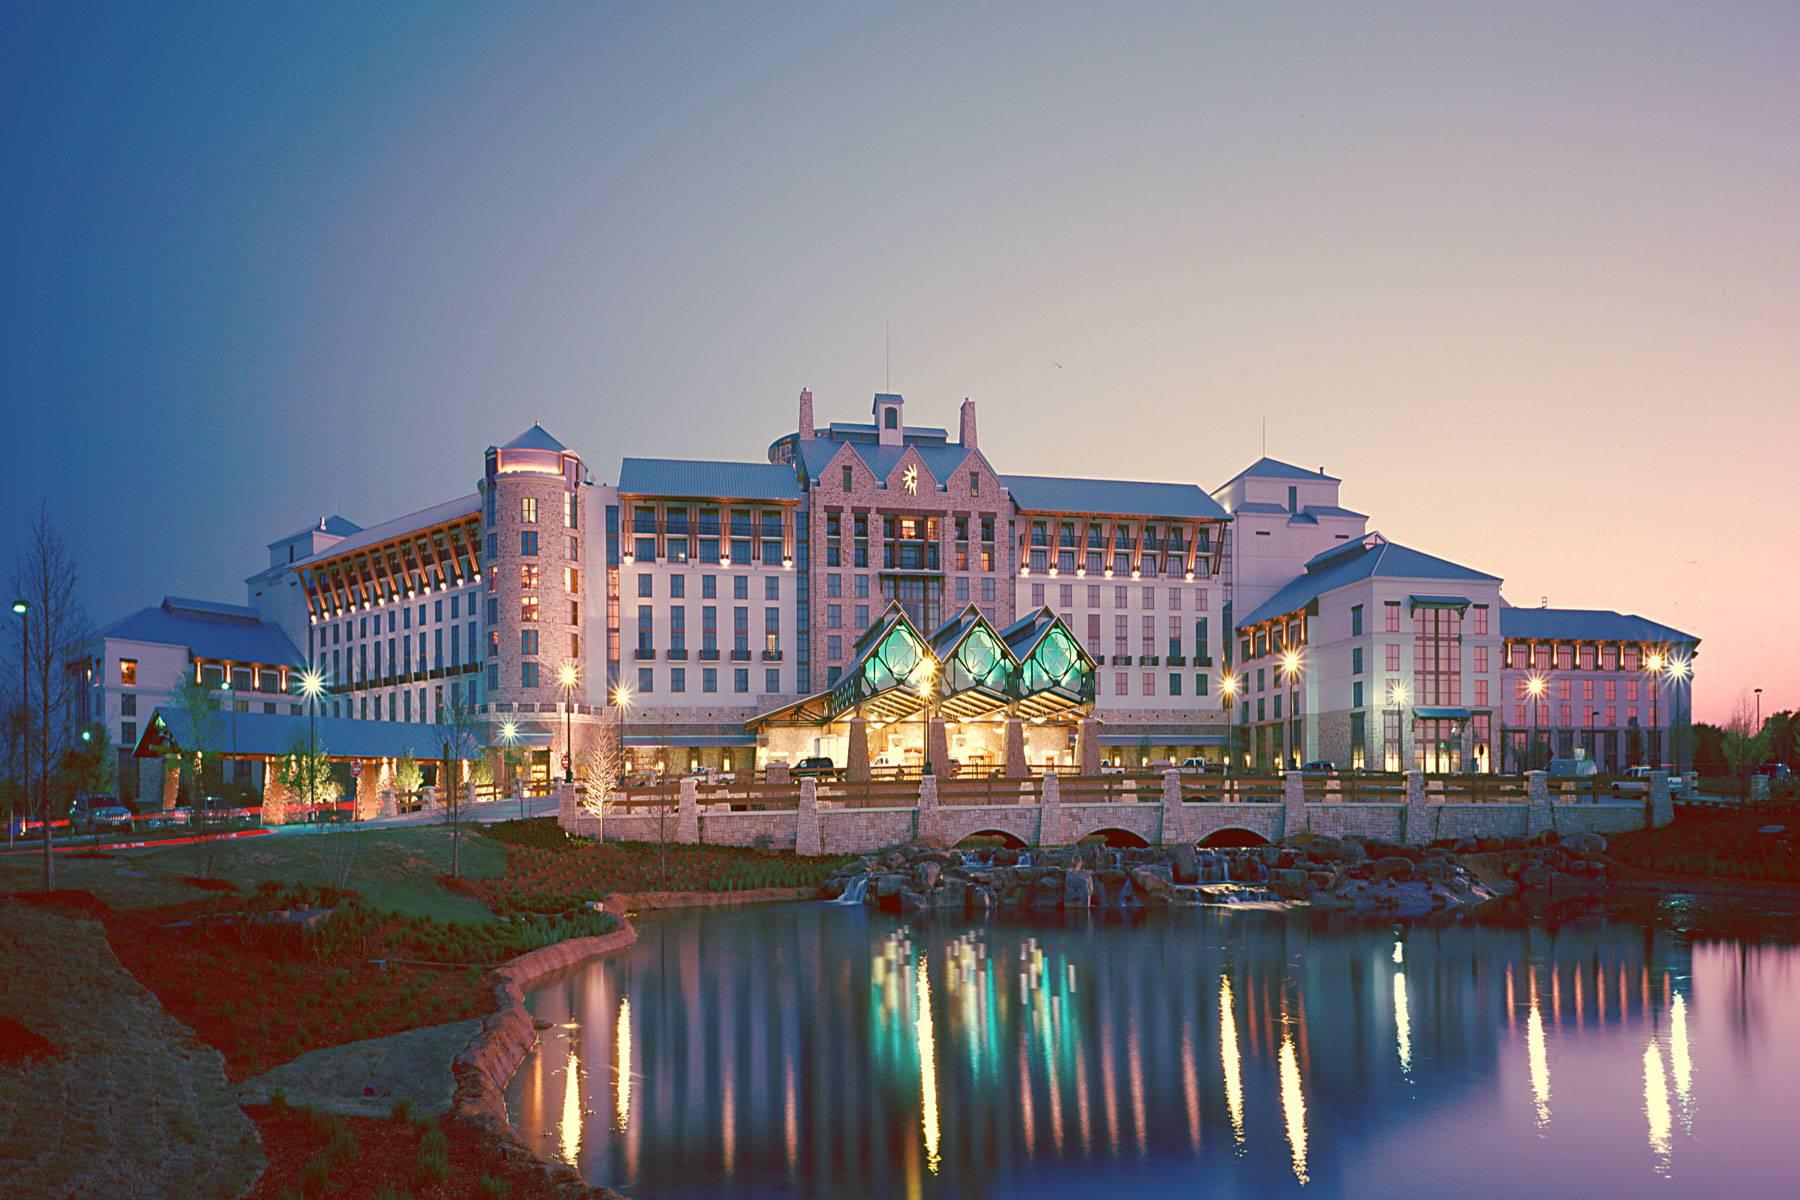 Gaylord Texan Resort & Convention Center ... - TripAdvisor